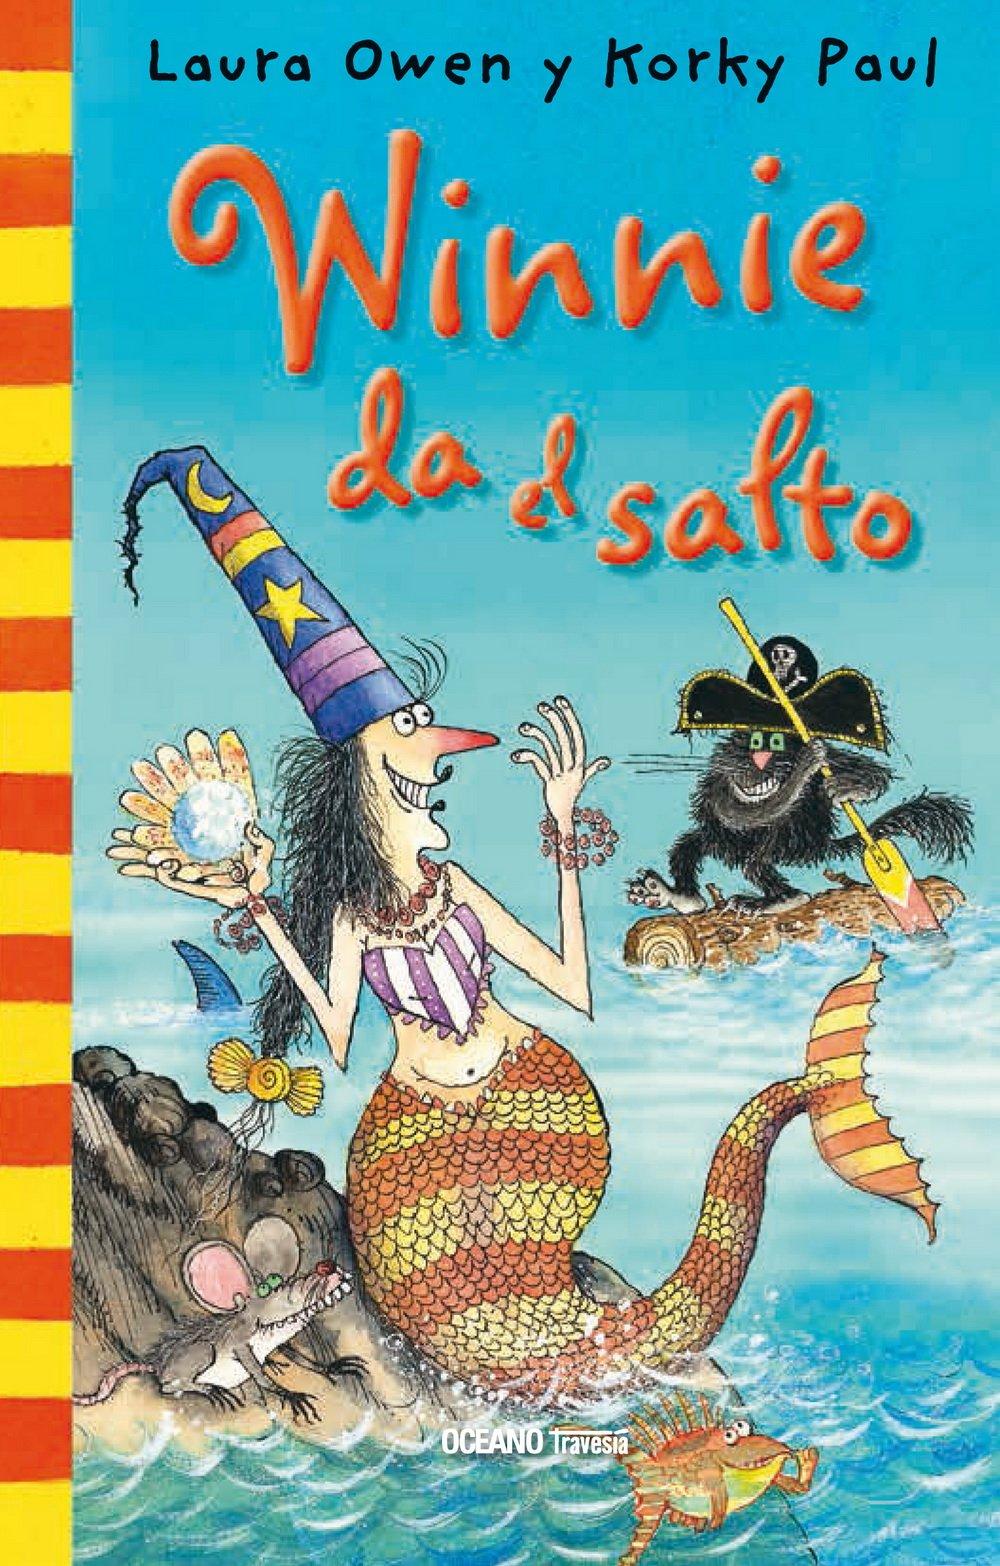 Download Winnie da el salto (Spanish Edition) (Winnie's World) PDF ePub fb2 book